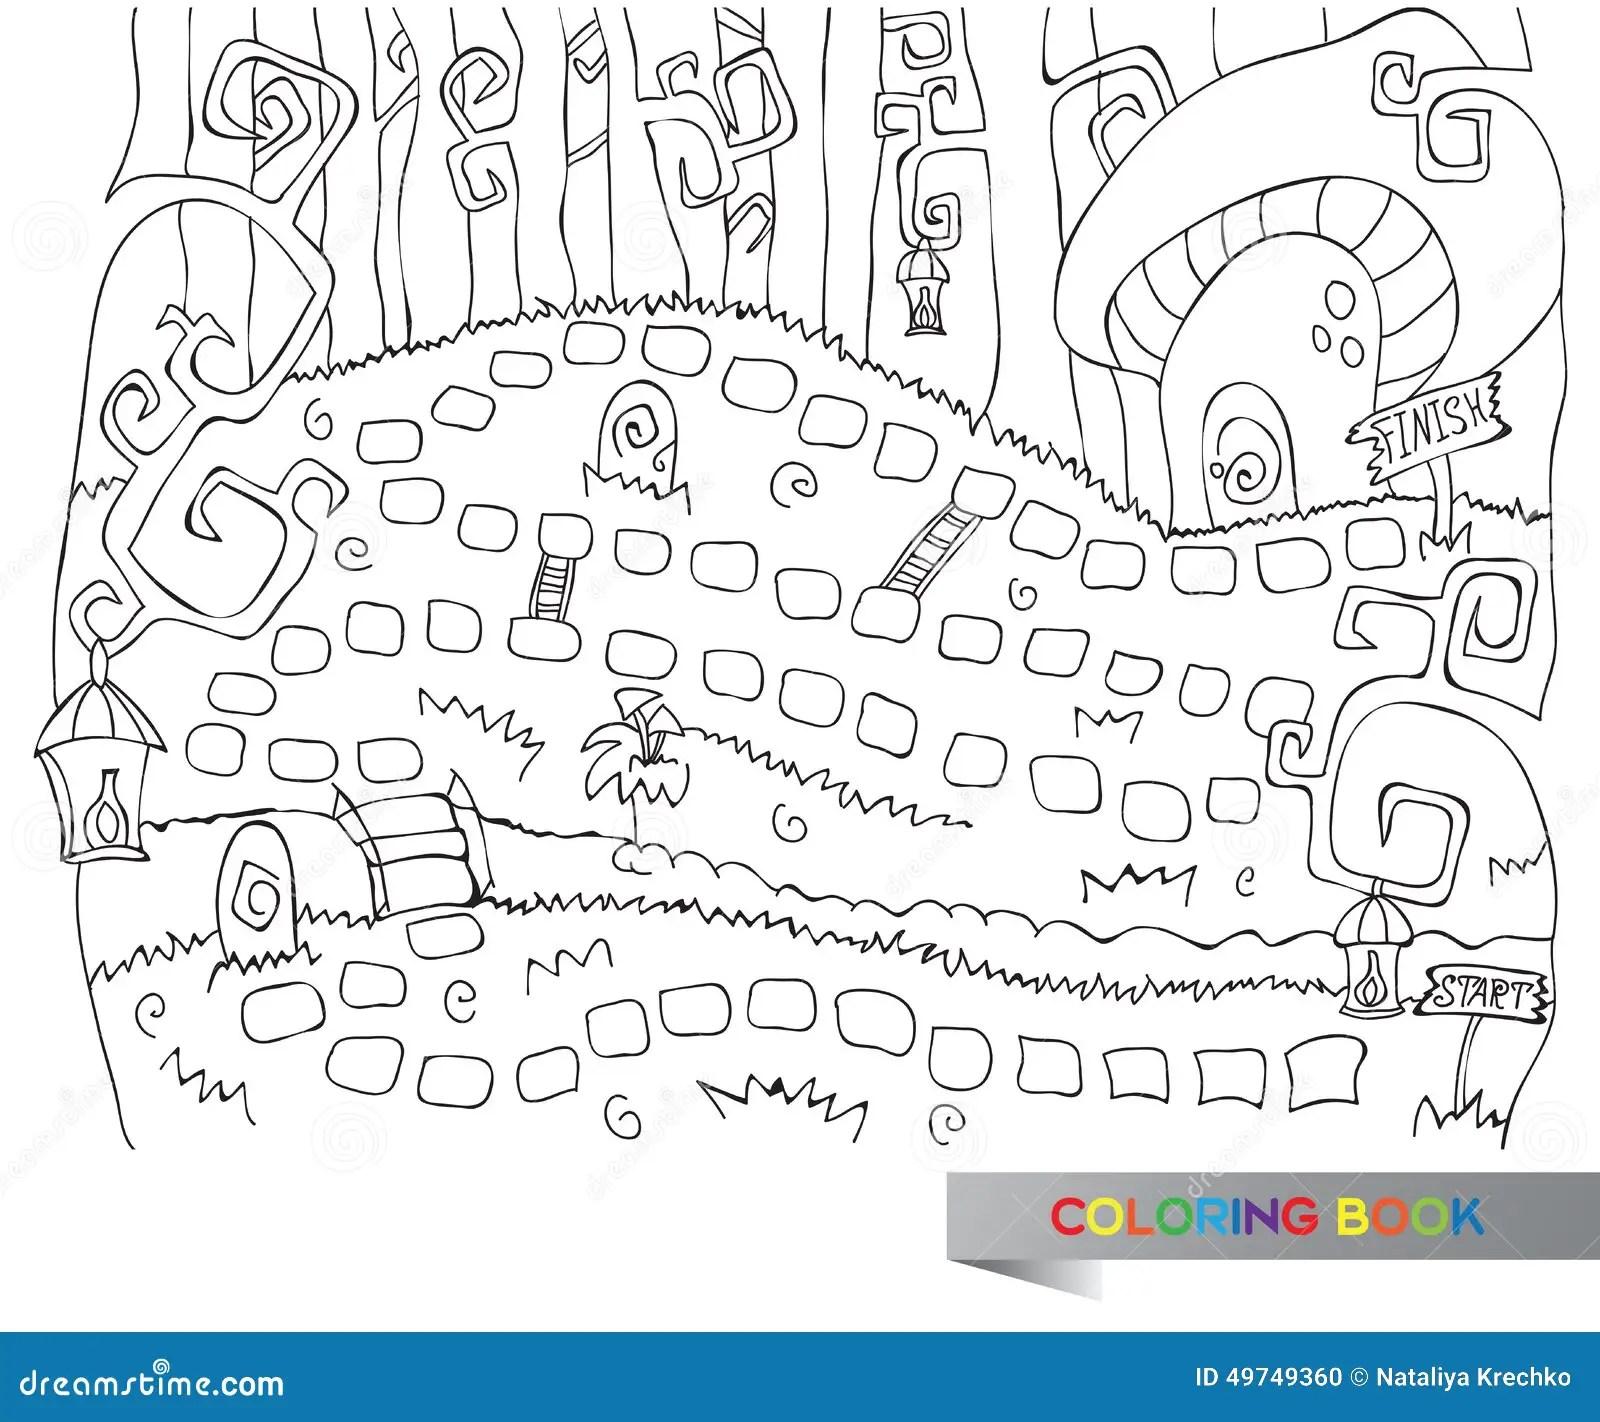 Go Board Game Sketch Coloring Page